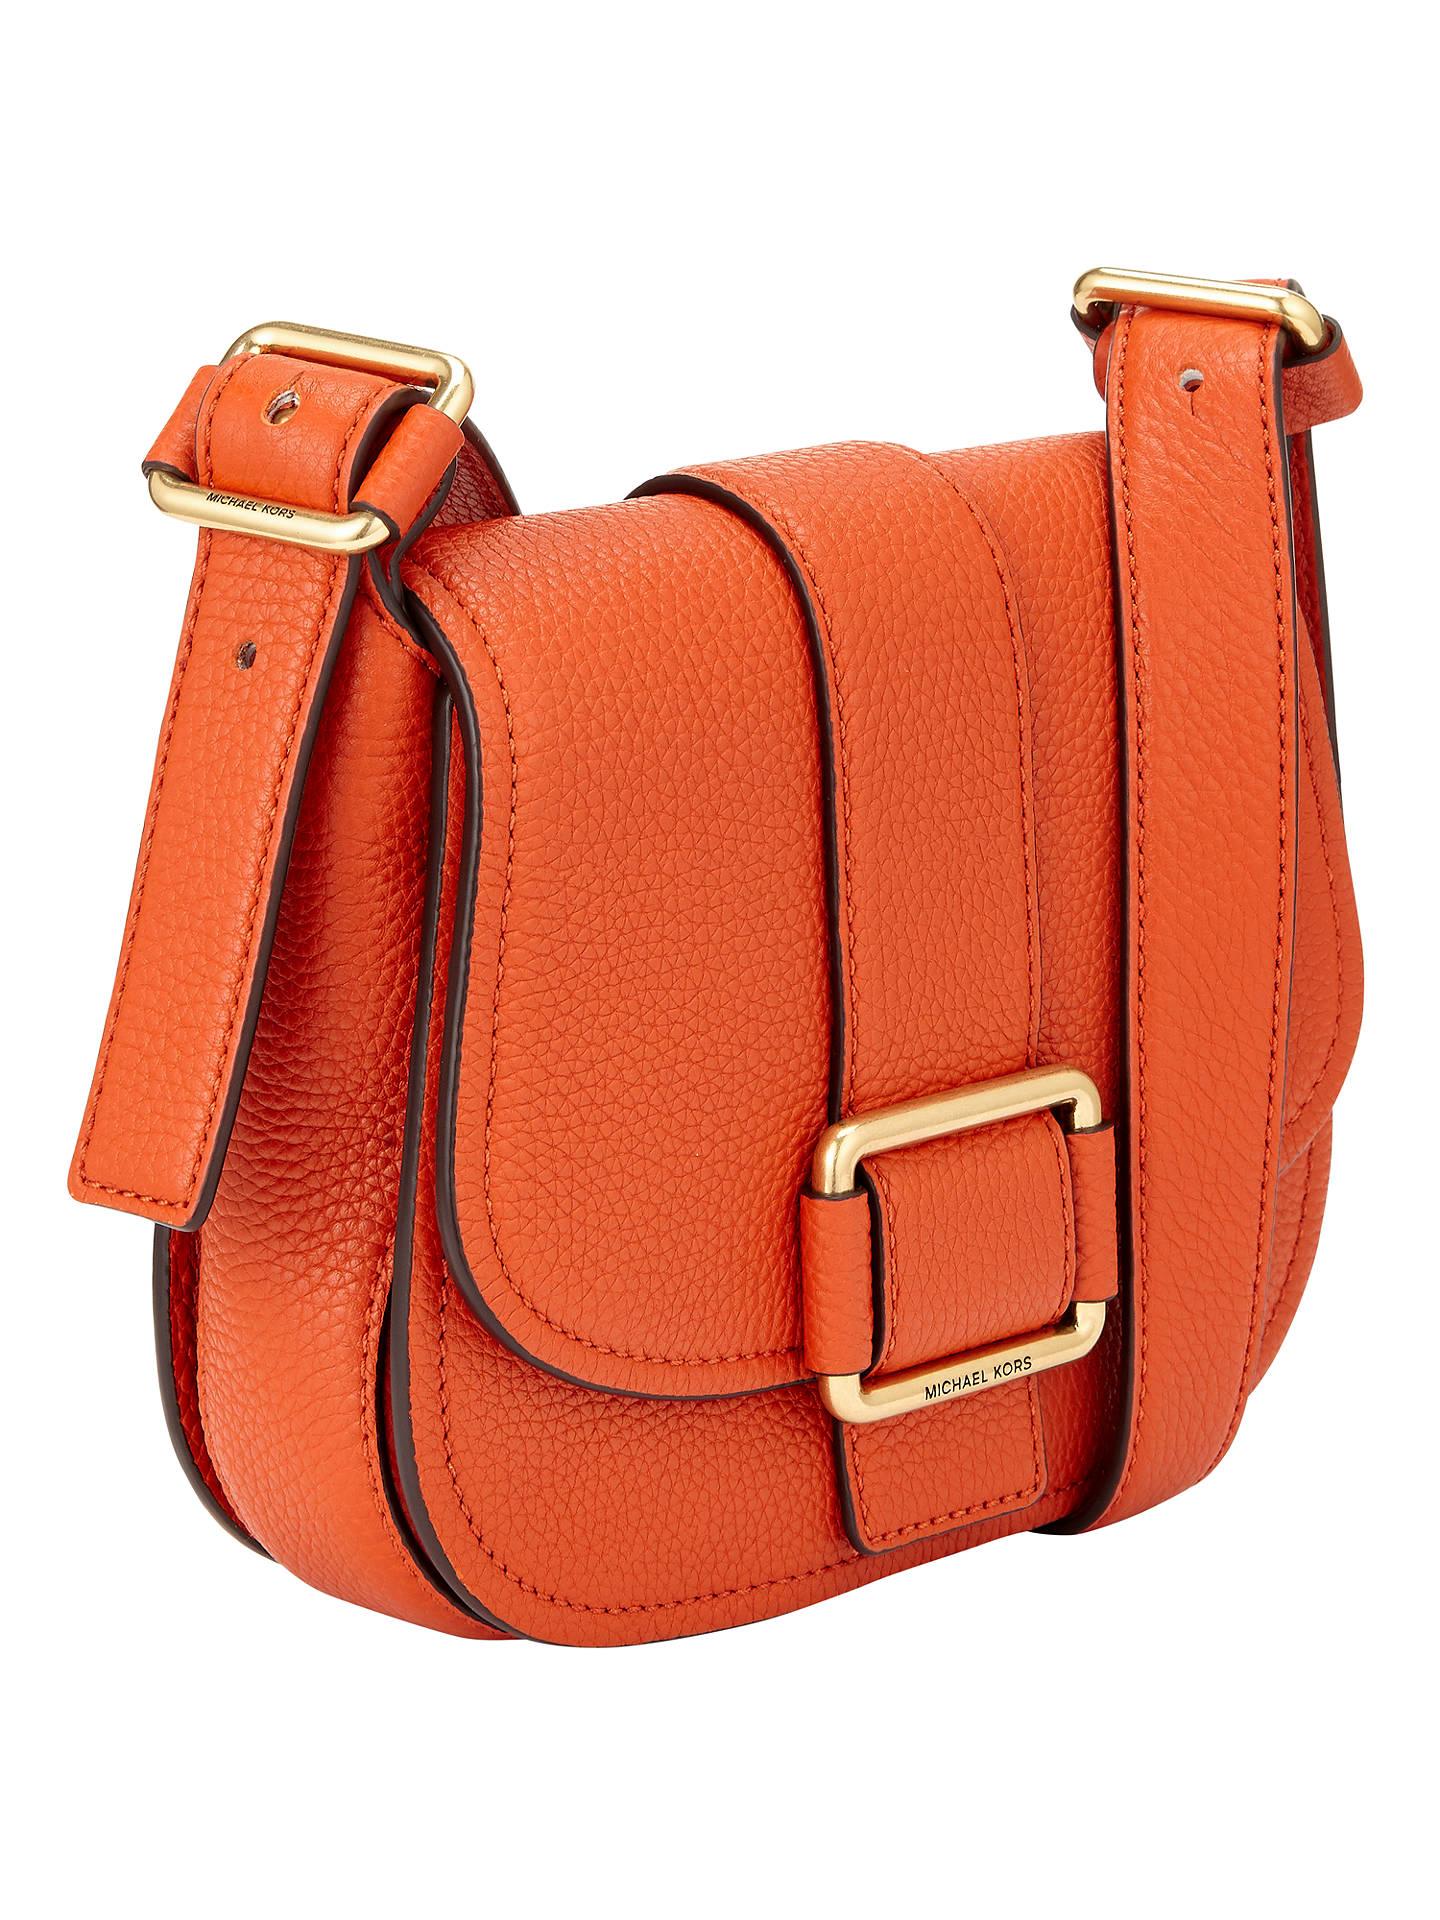 69a2cb30b7411 MICHAEL Michael Kors Maxine Medium Leather Across Body Bag at John ...